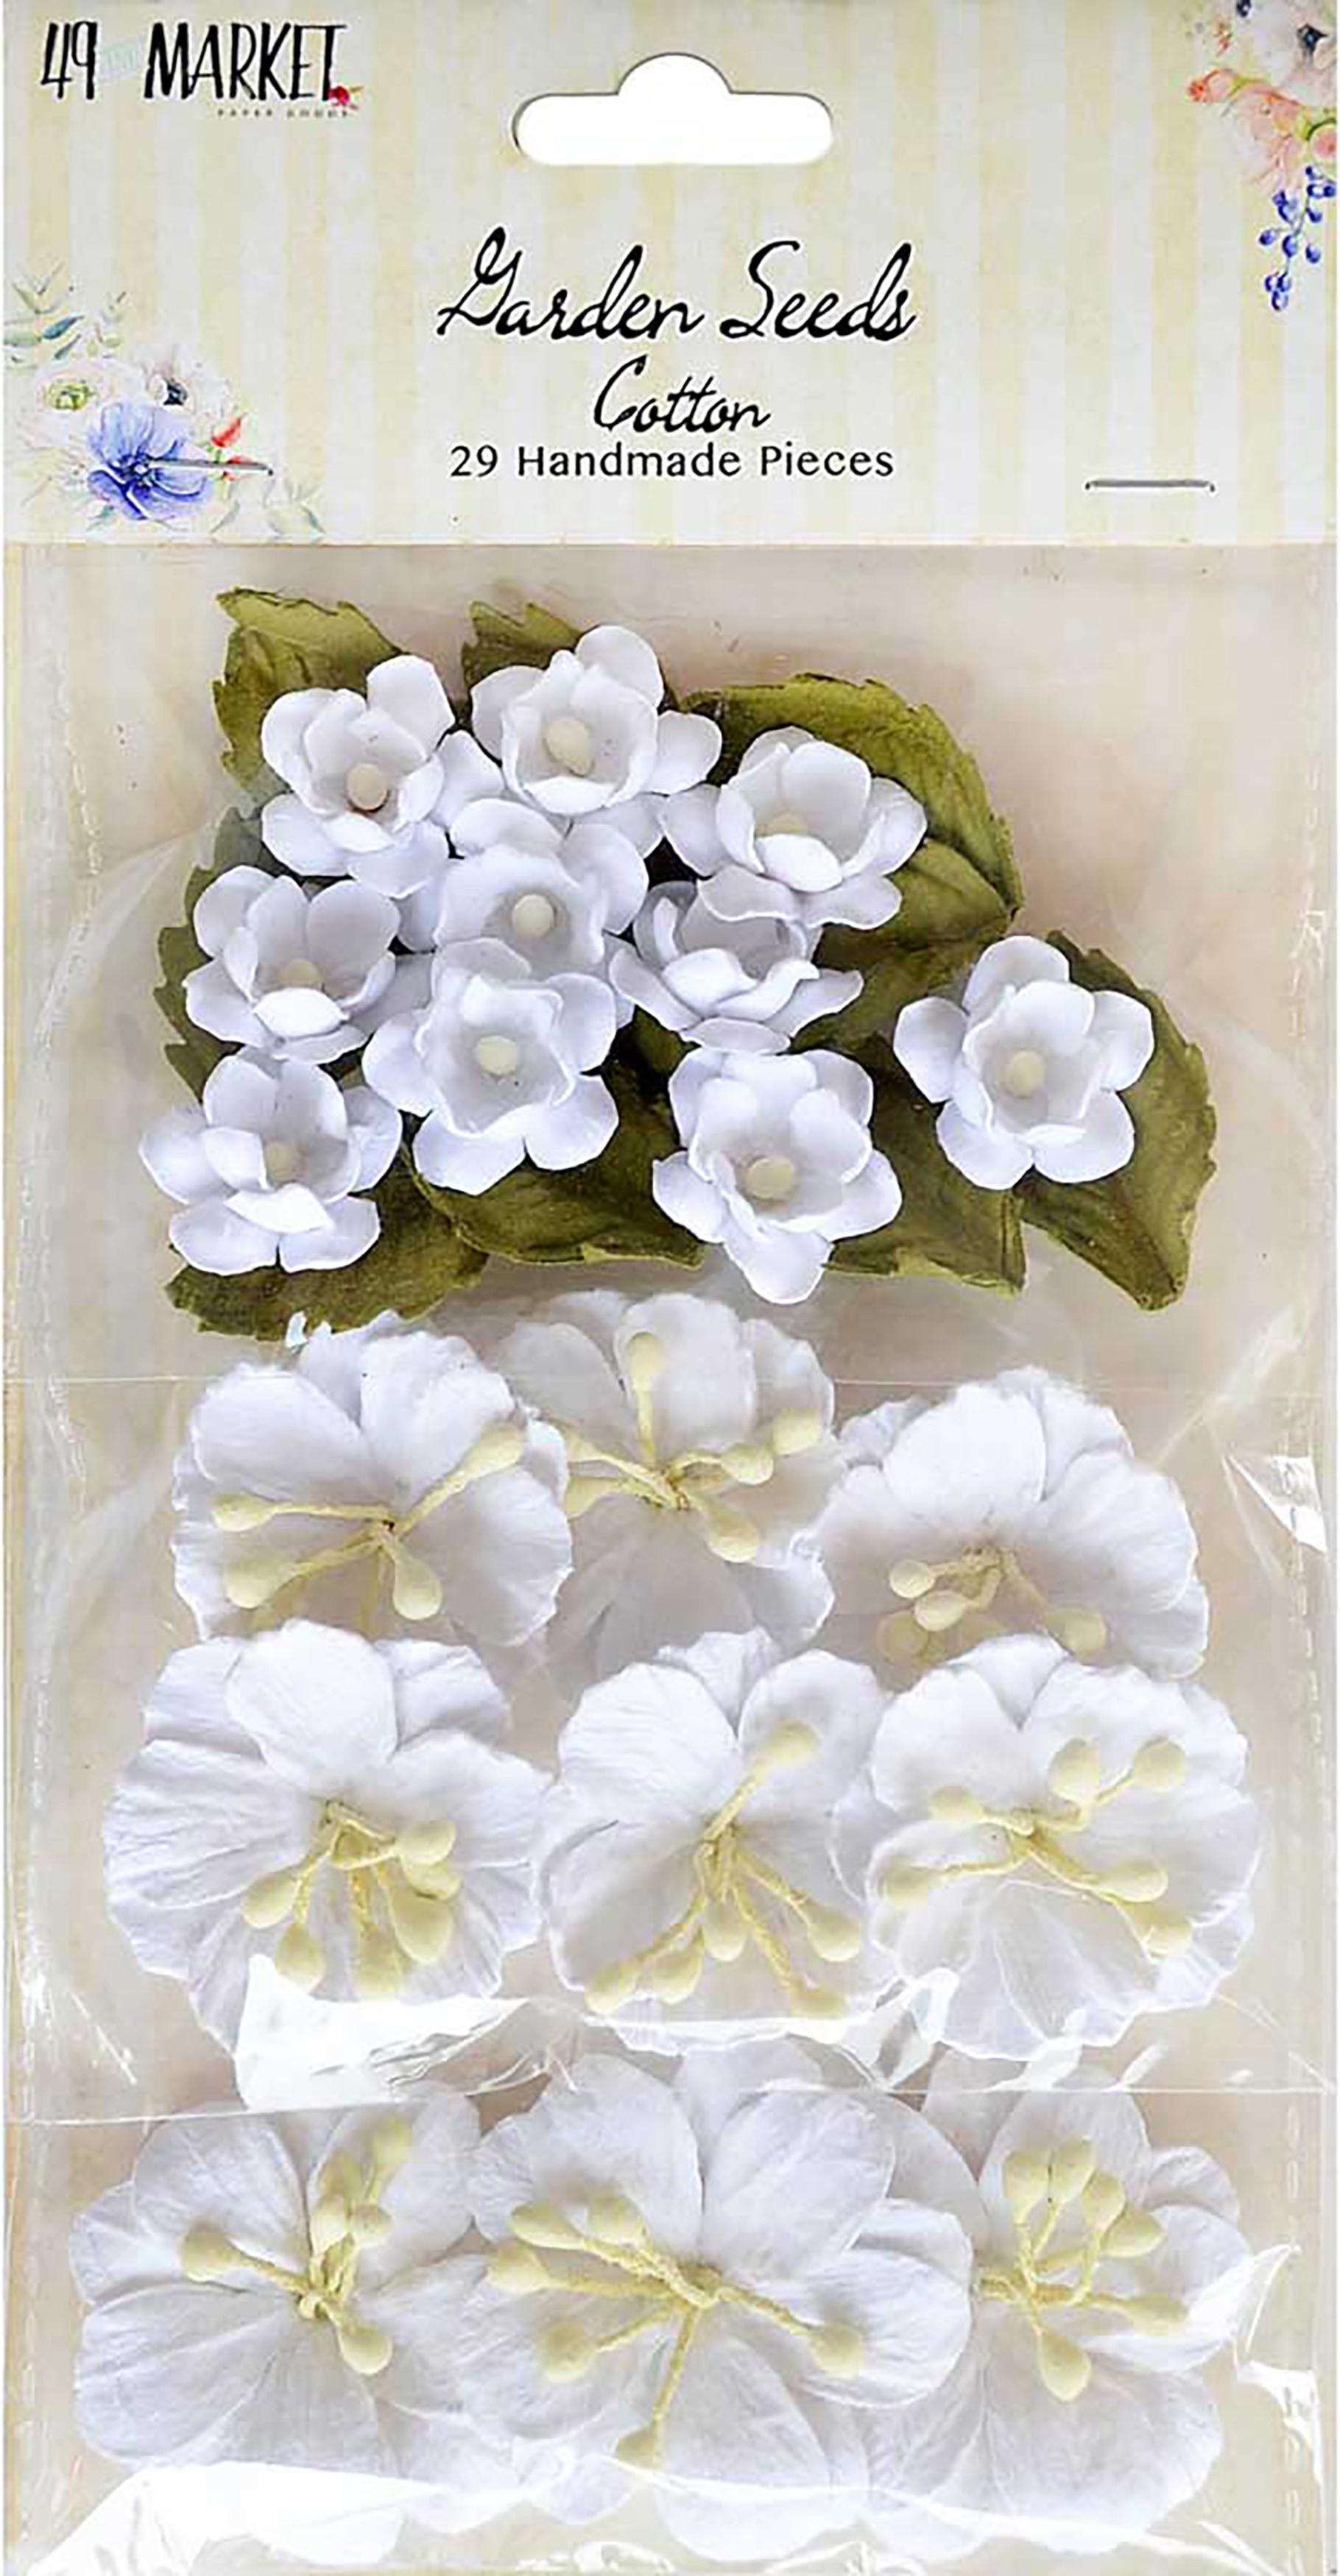 Garden Seeds - Cotton